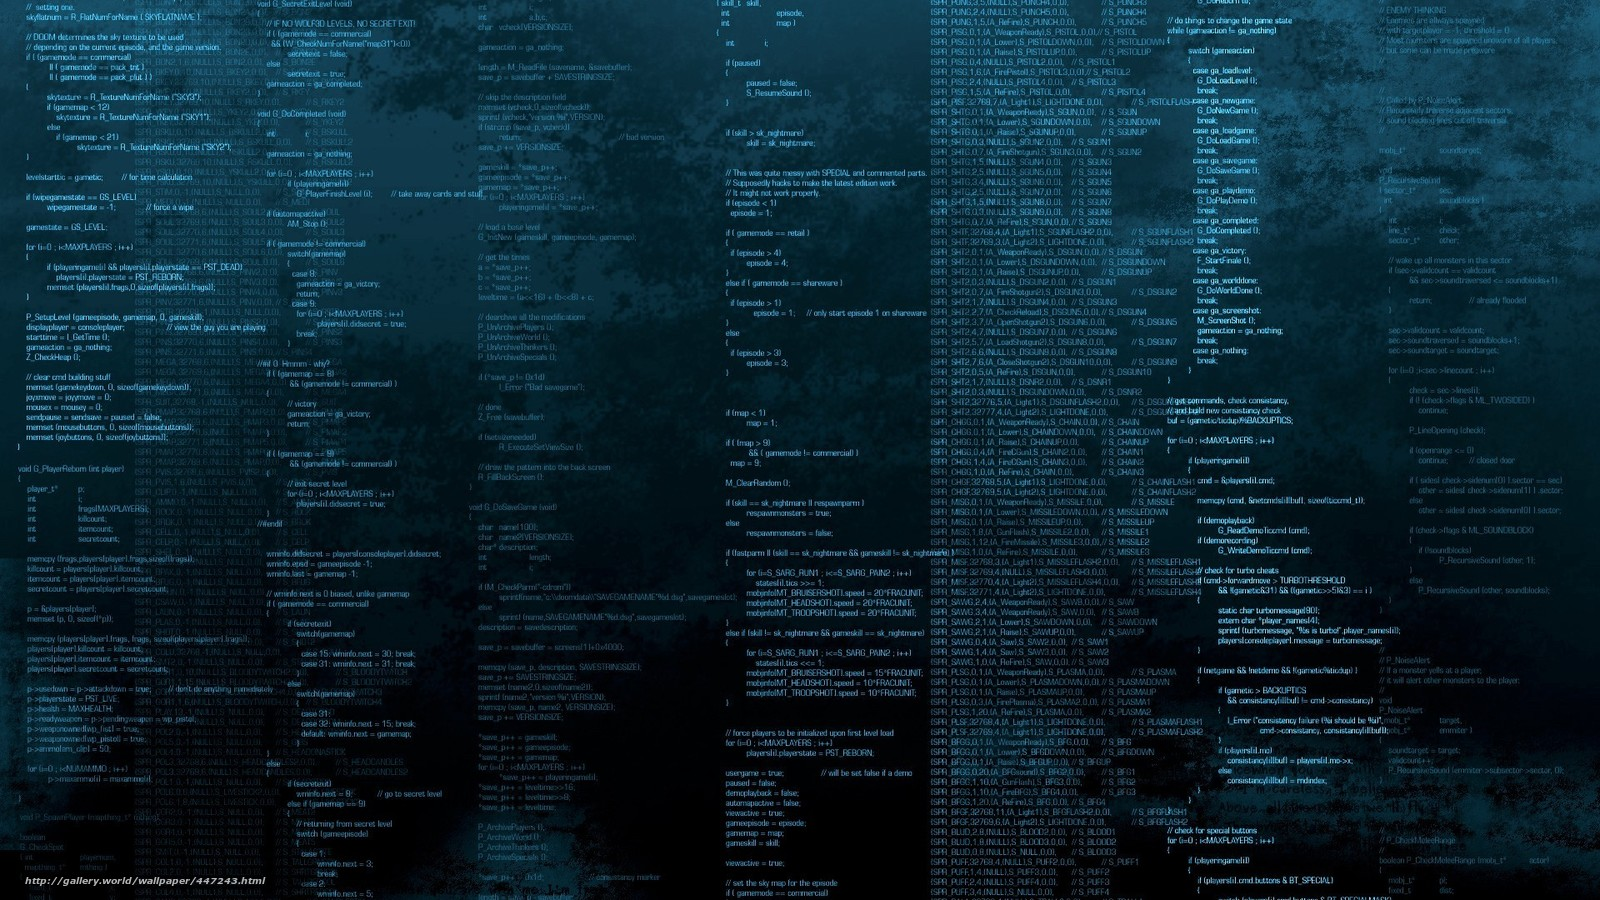 Download wallpaper hi tech free desktop wallpaper in the resolution